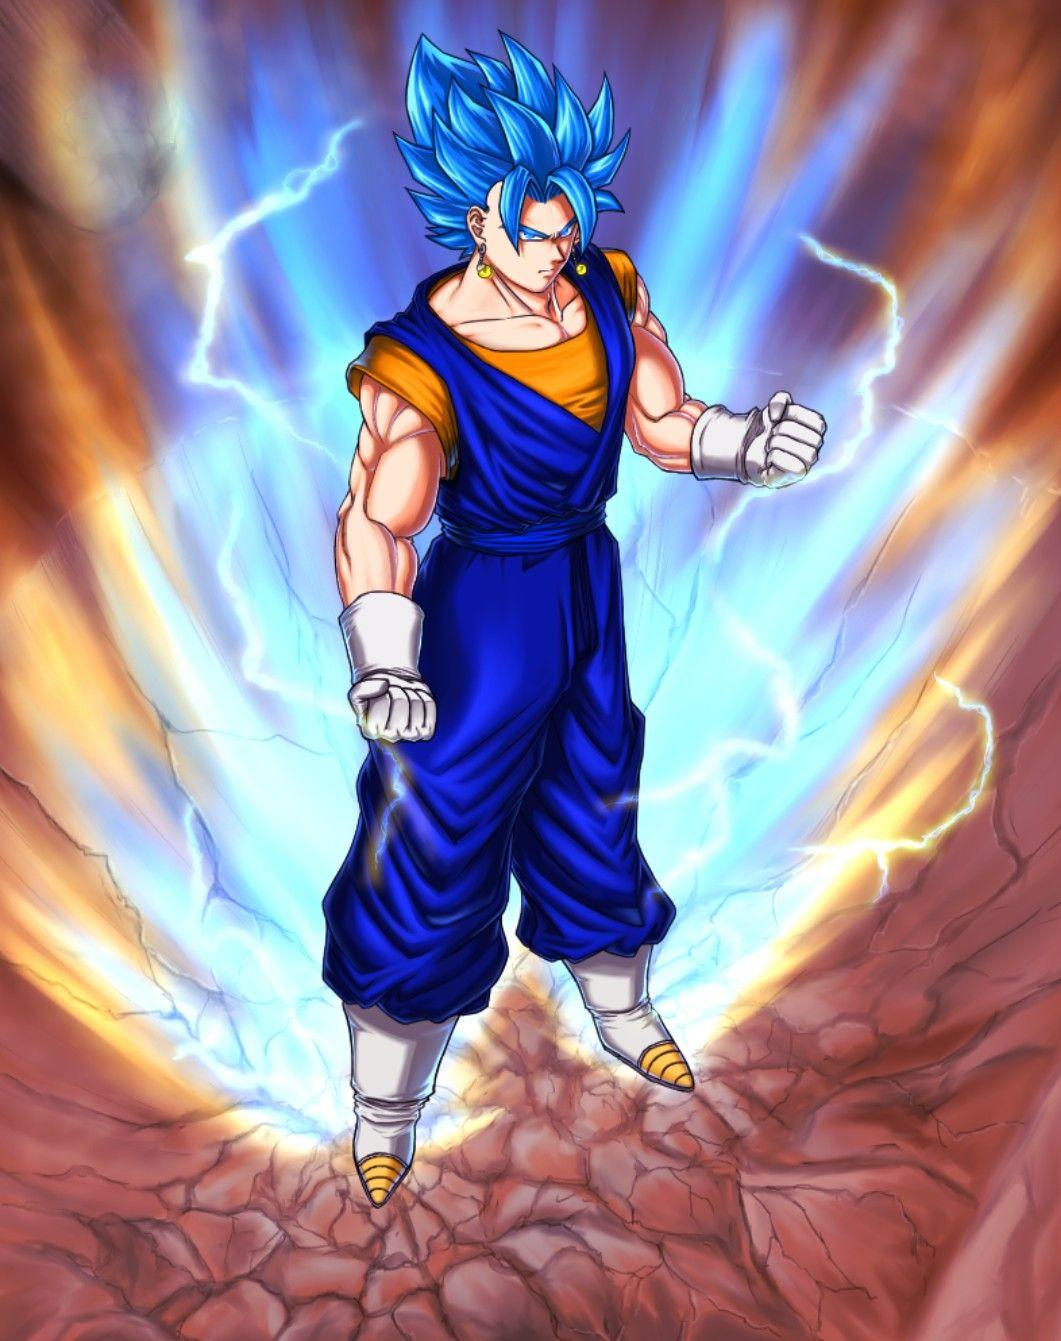 Fullpower Vegito Blue Dbz characters, Dragon ball super